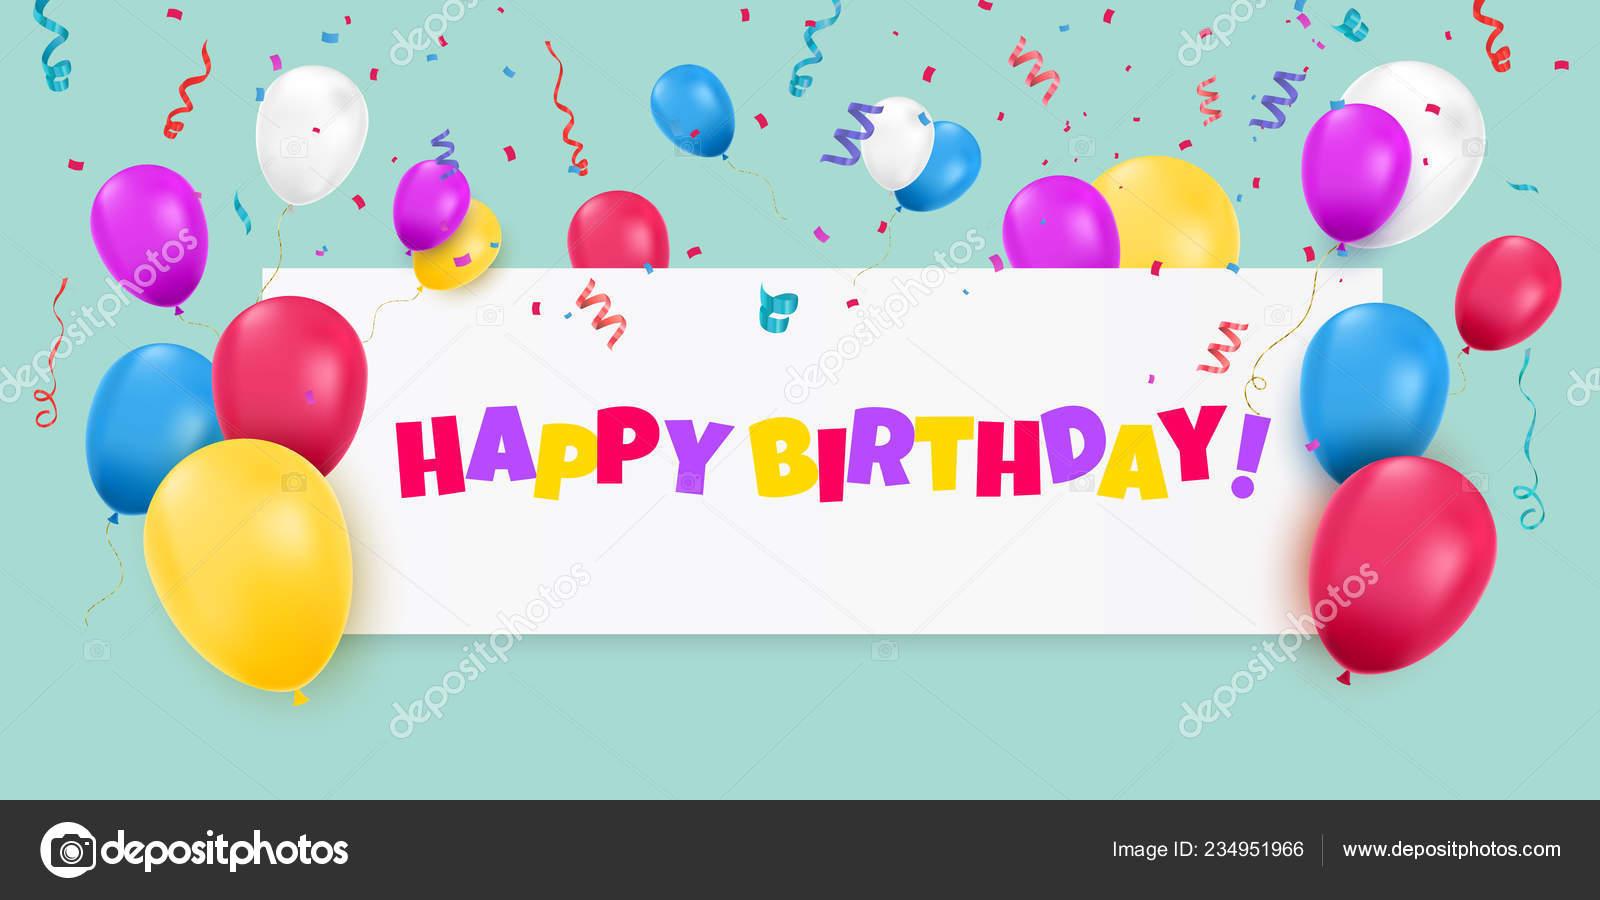 Banner Feliz Aniversario: Feliz Banner De Aniversário Com Balões De Cor E Confetes